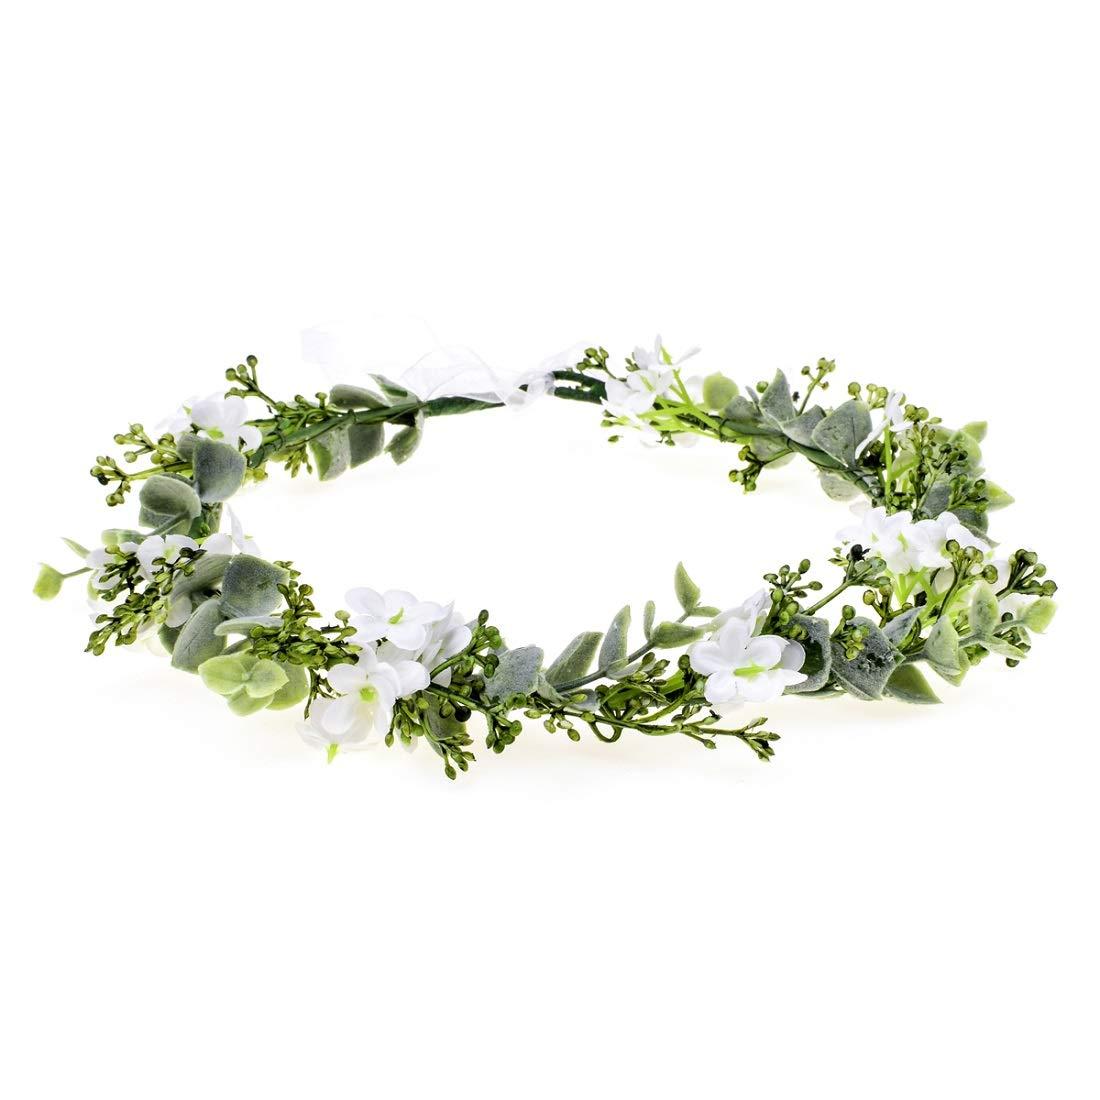 Vividsun Bridal Green Leaf Crown Bohemian Headpiece Floral Headband Photo Prop (white flower)